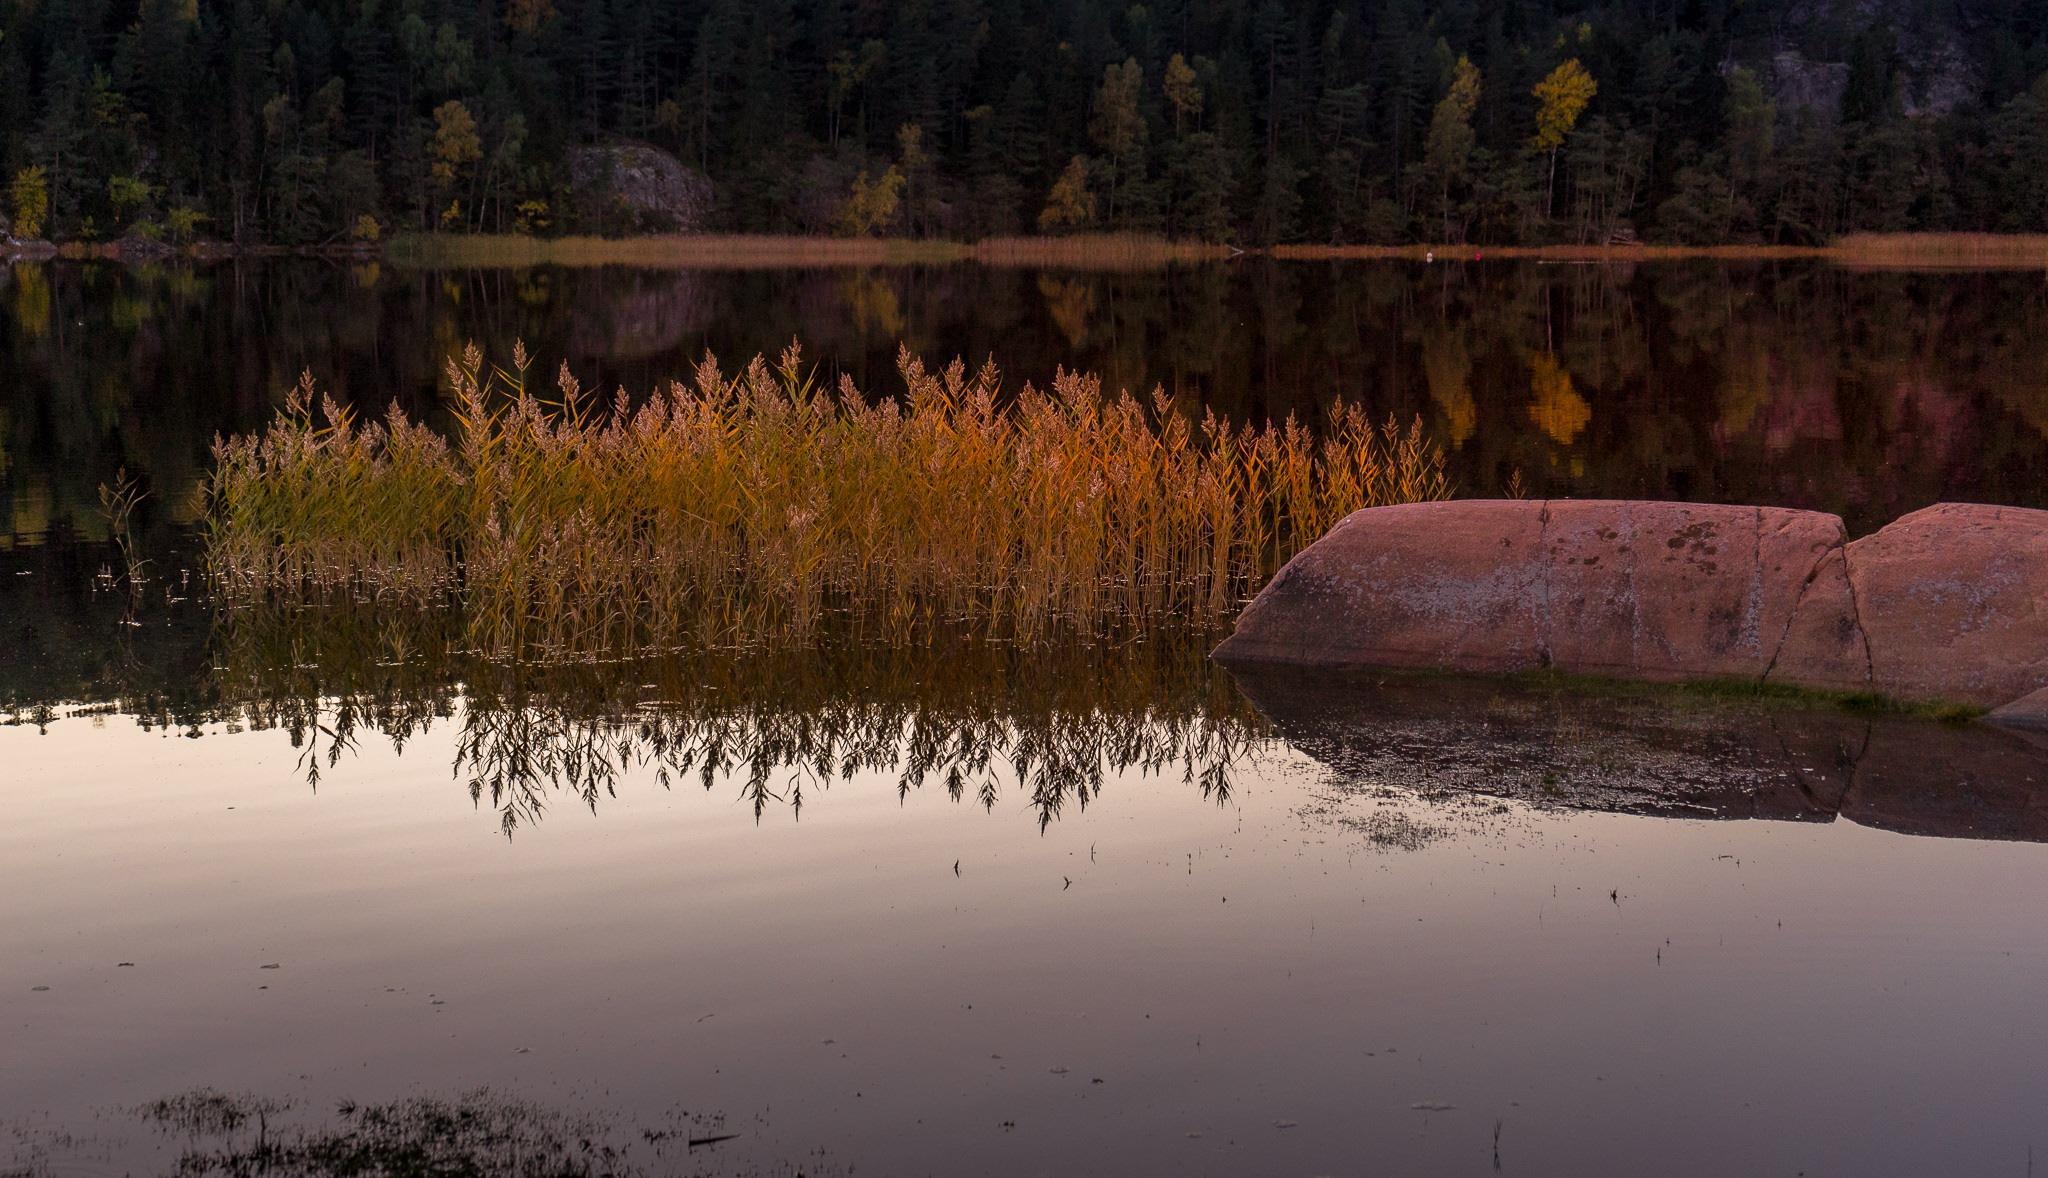 Calm evening by Jens-Chr.